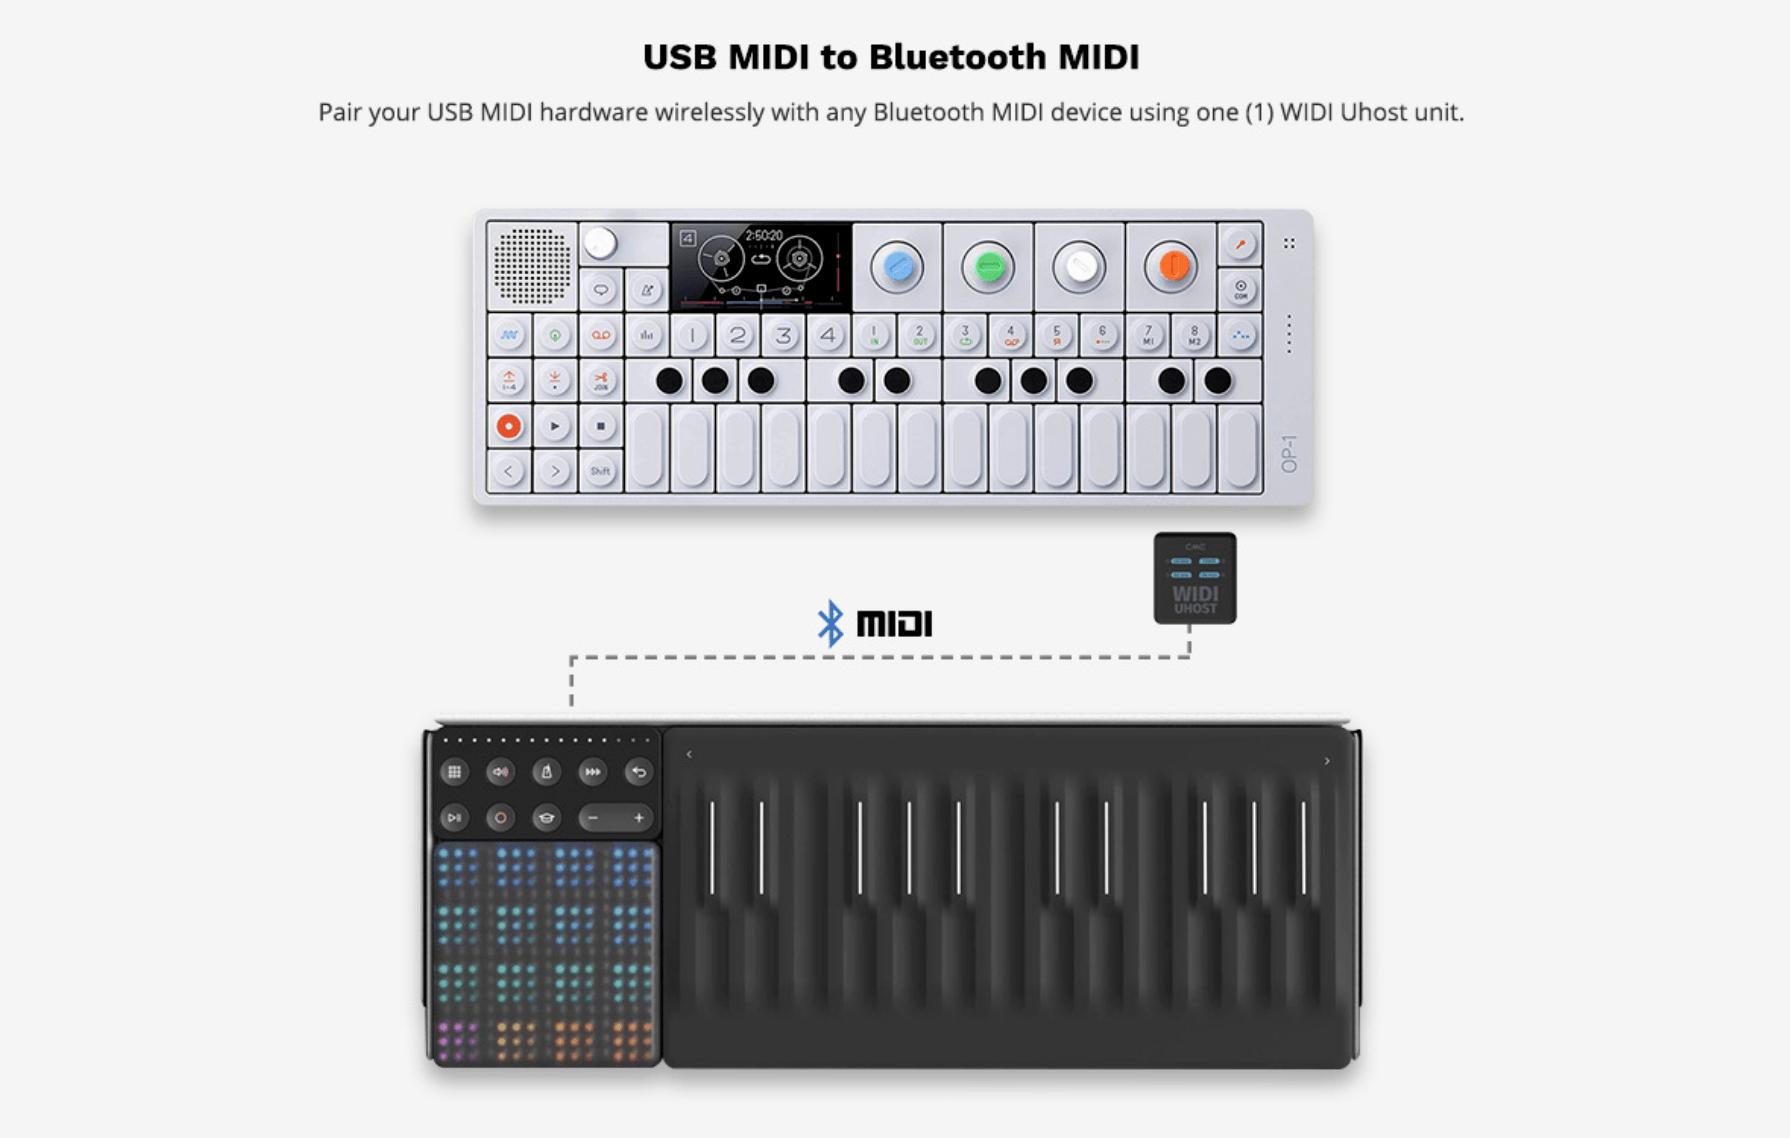 USB MIDI uHost WIDI